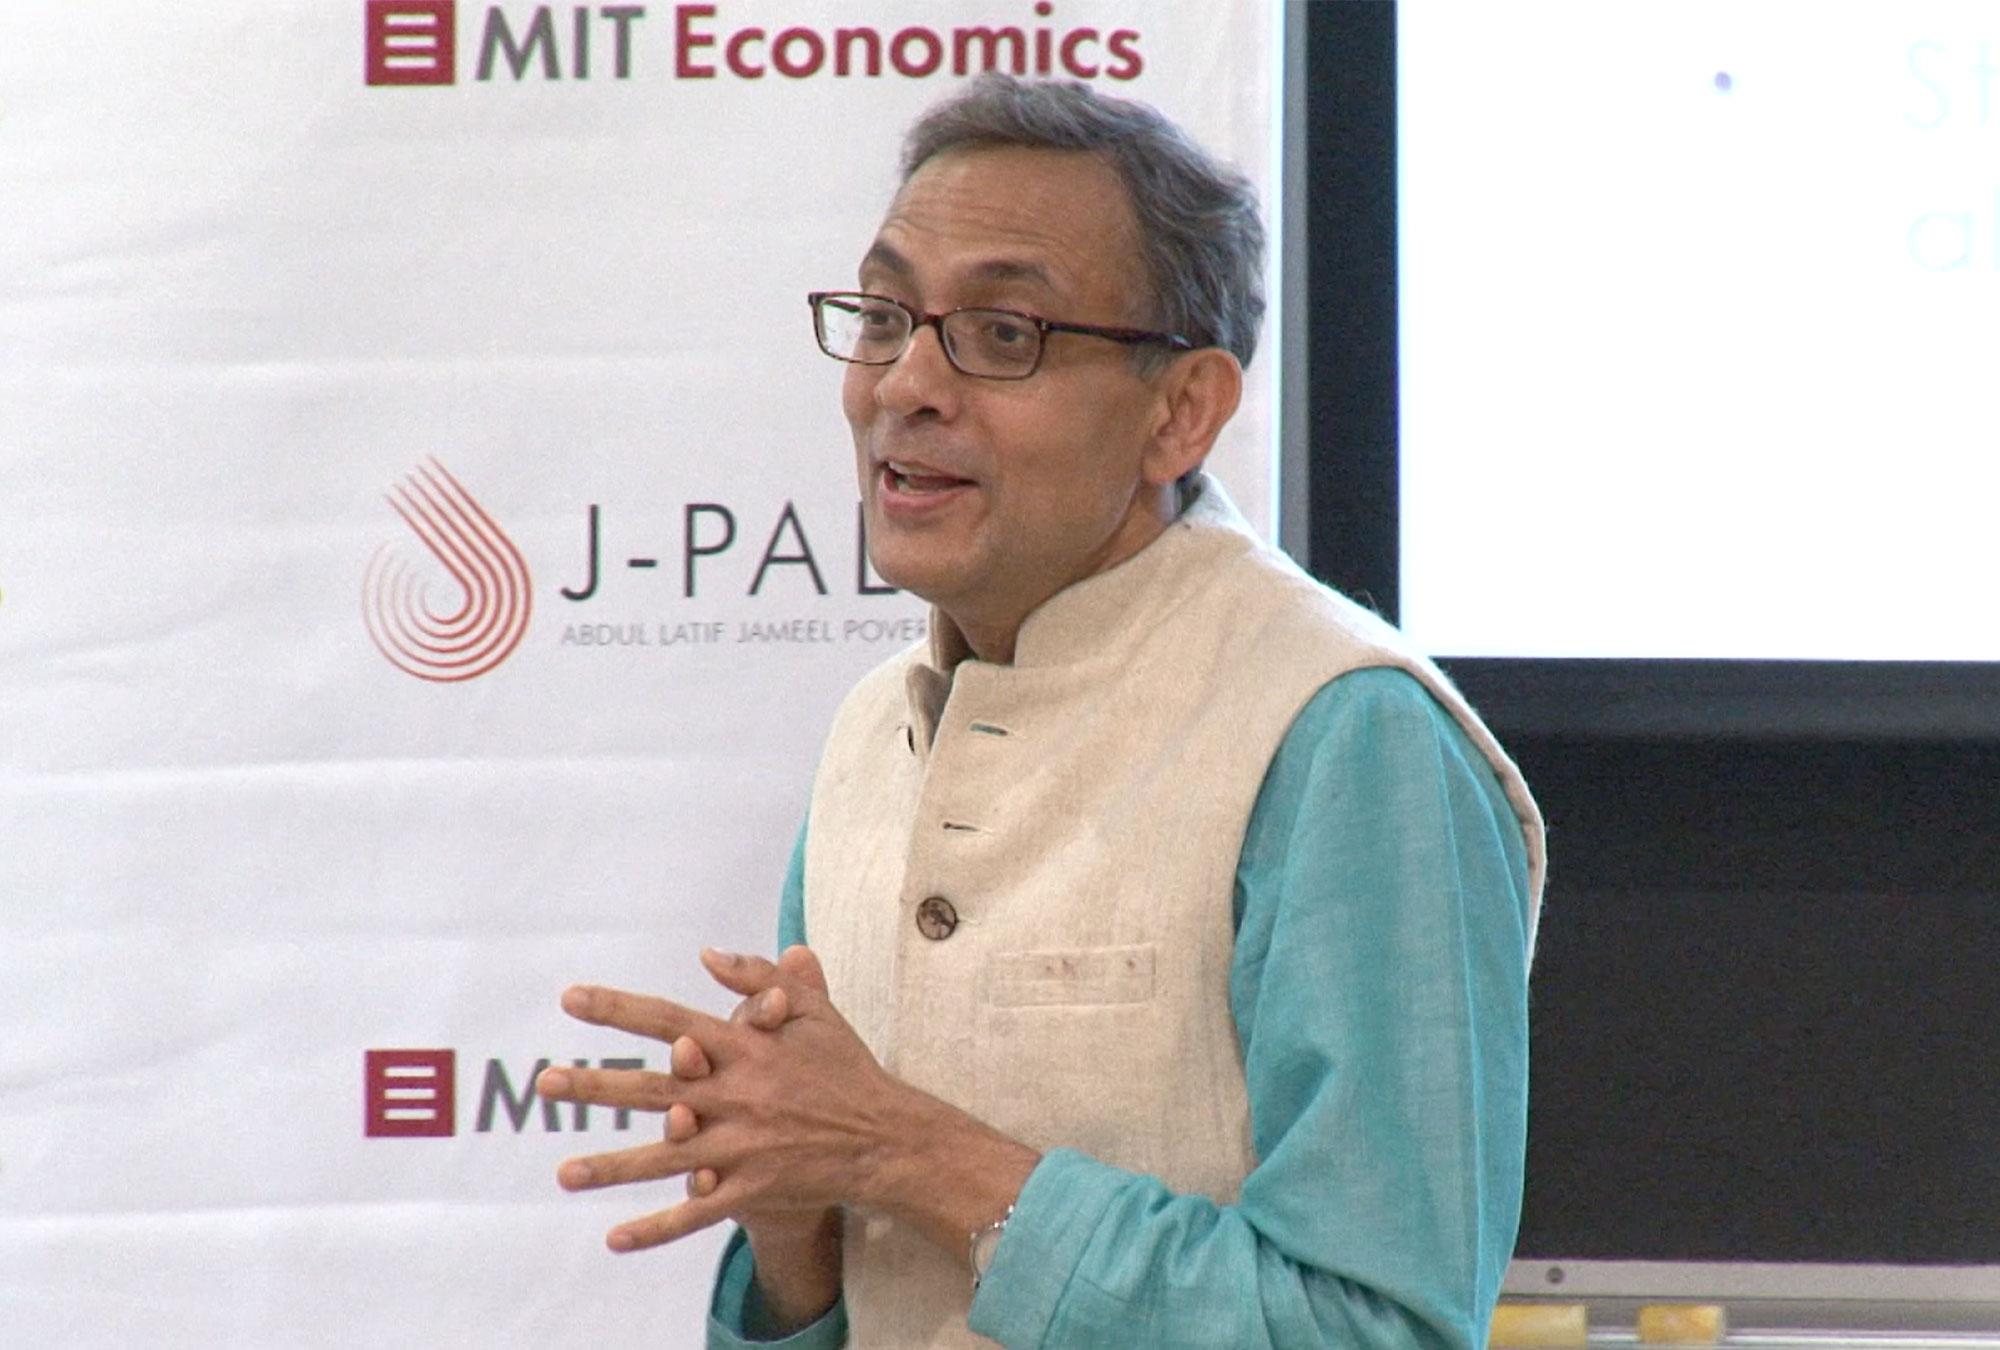 Abhijit Banerjee presenting